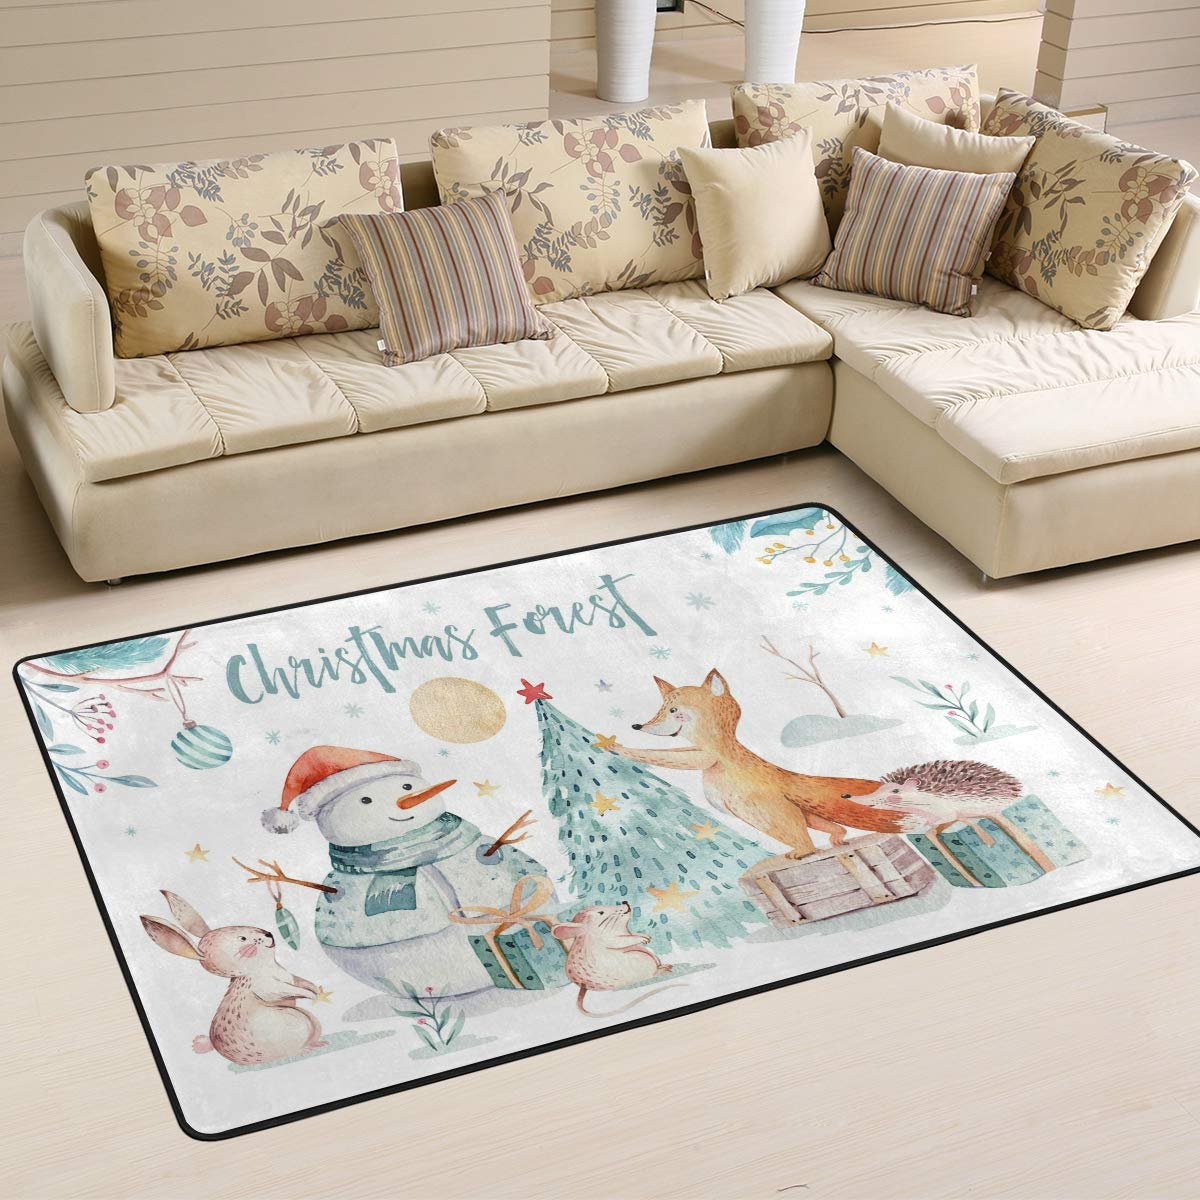 ALAZA Merry Christmas Snowman Tree Fox Rabbit Animal Area Rug Soft Non Slip Floor Mat Washable Carpet for Bedroom Living Room 1 Piece 4x6 Feet